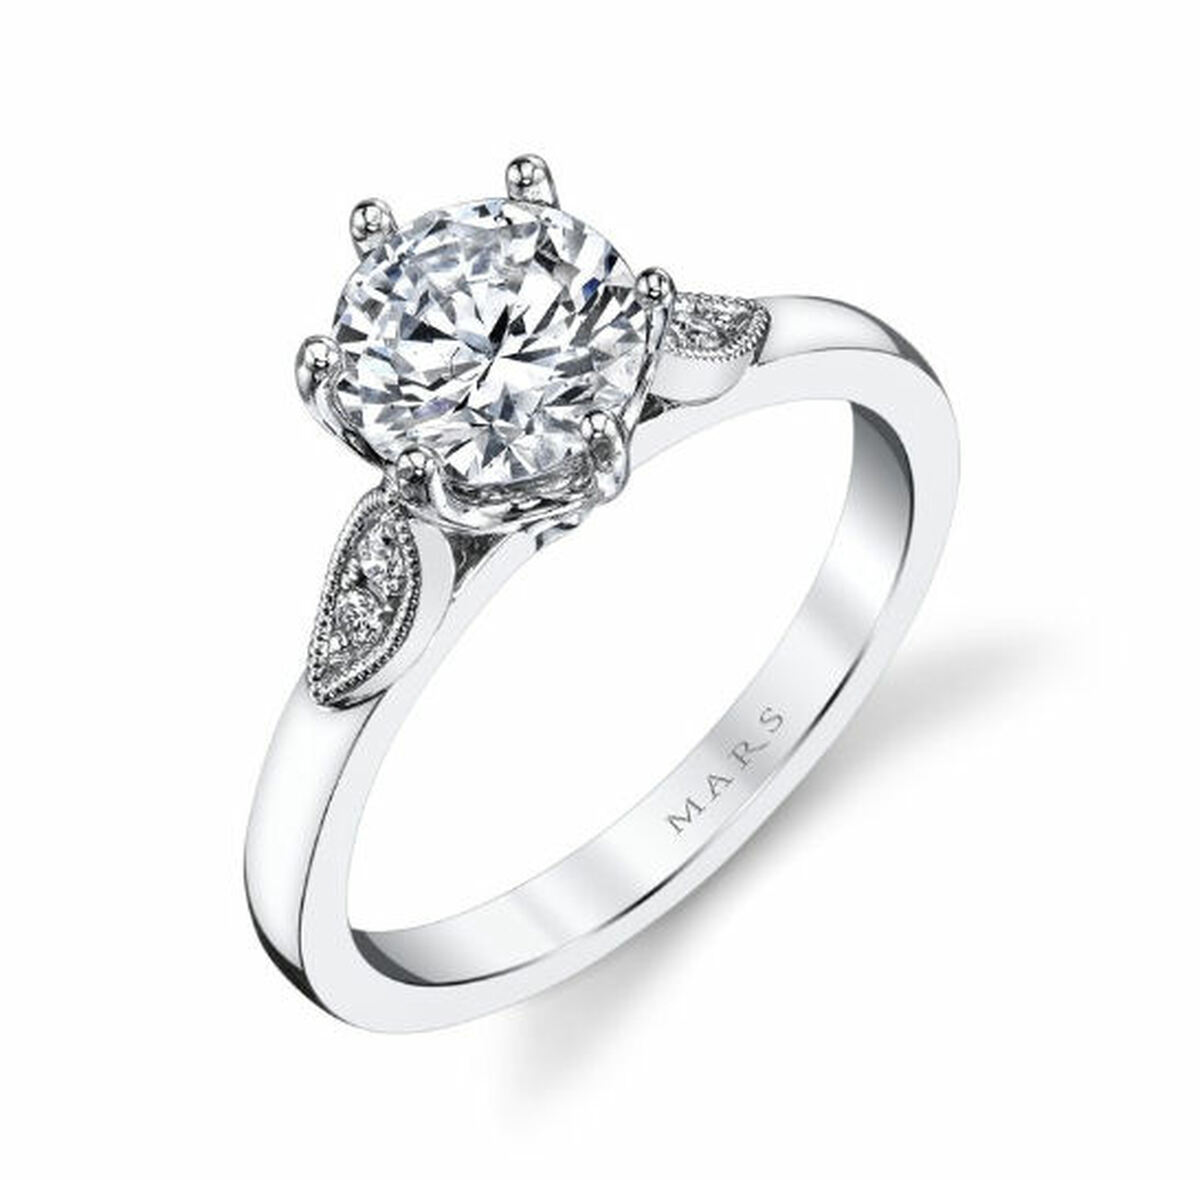 0.10 Ct Tw Diamond Engagement Ring